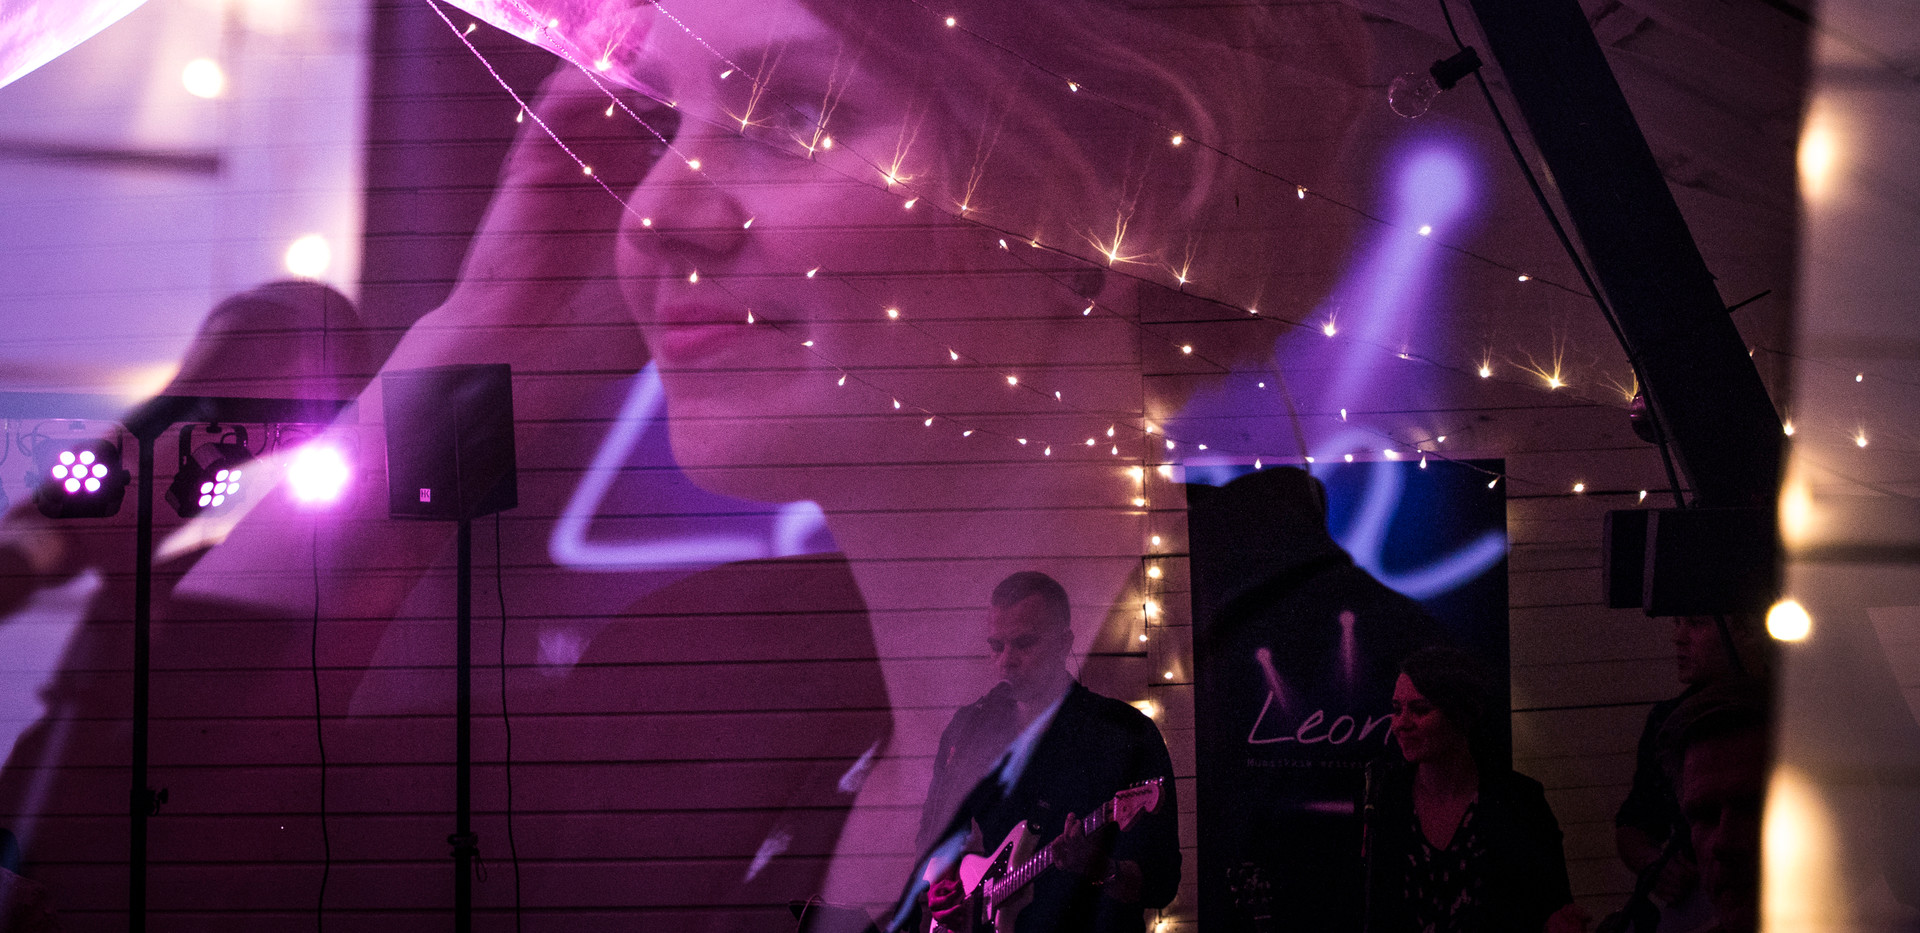 @Anne Lius-Liimatainen/LiuLii - Photo and Story